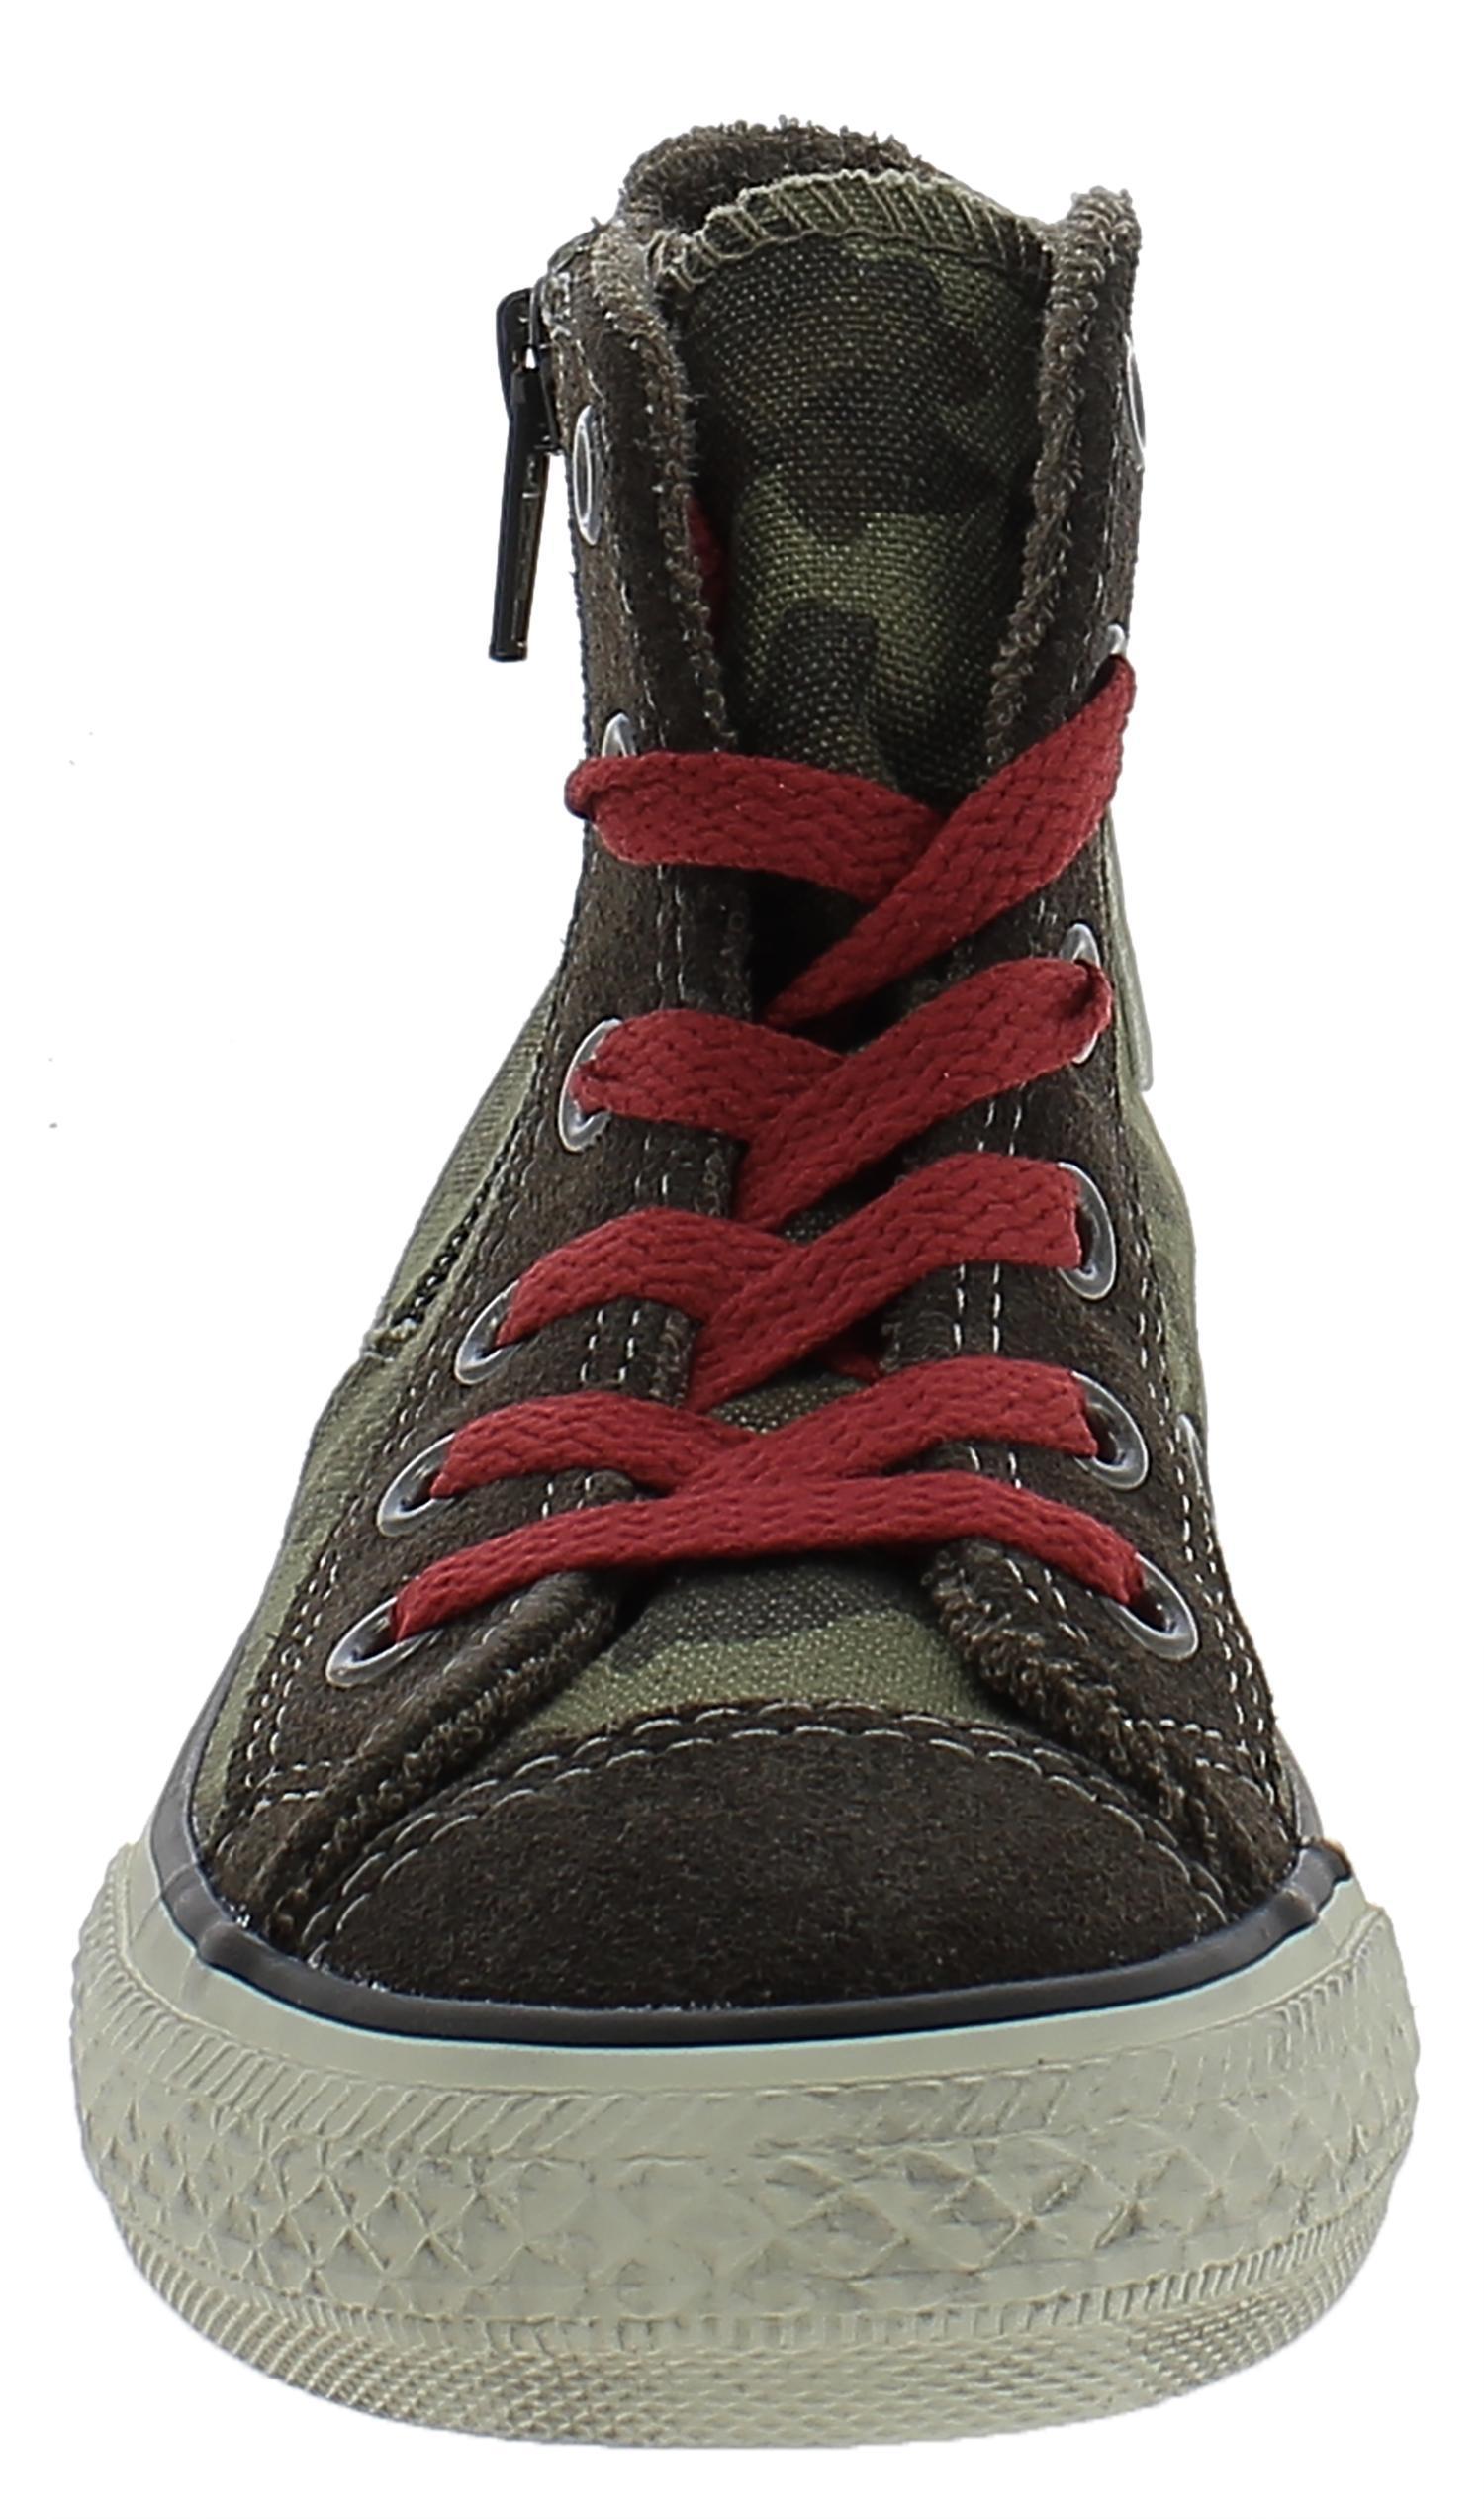 converse converse all star ct side zip  scarpe bambino verdi 641234c